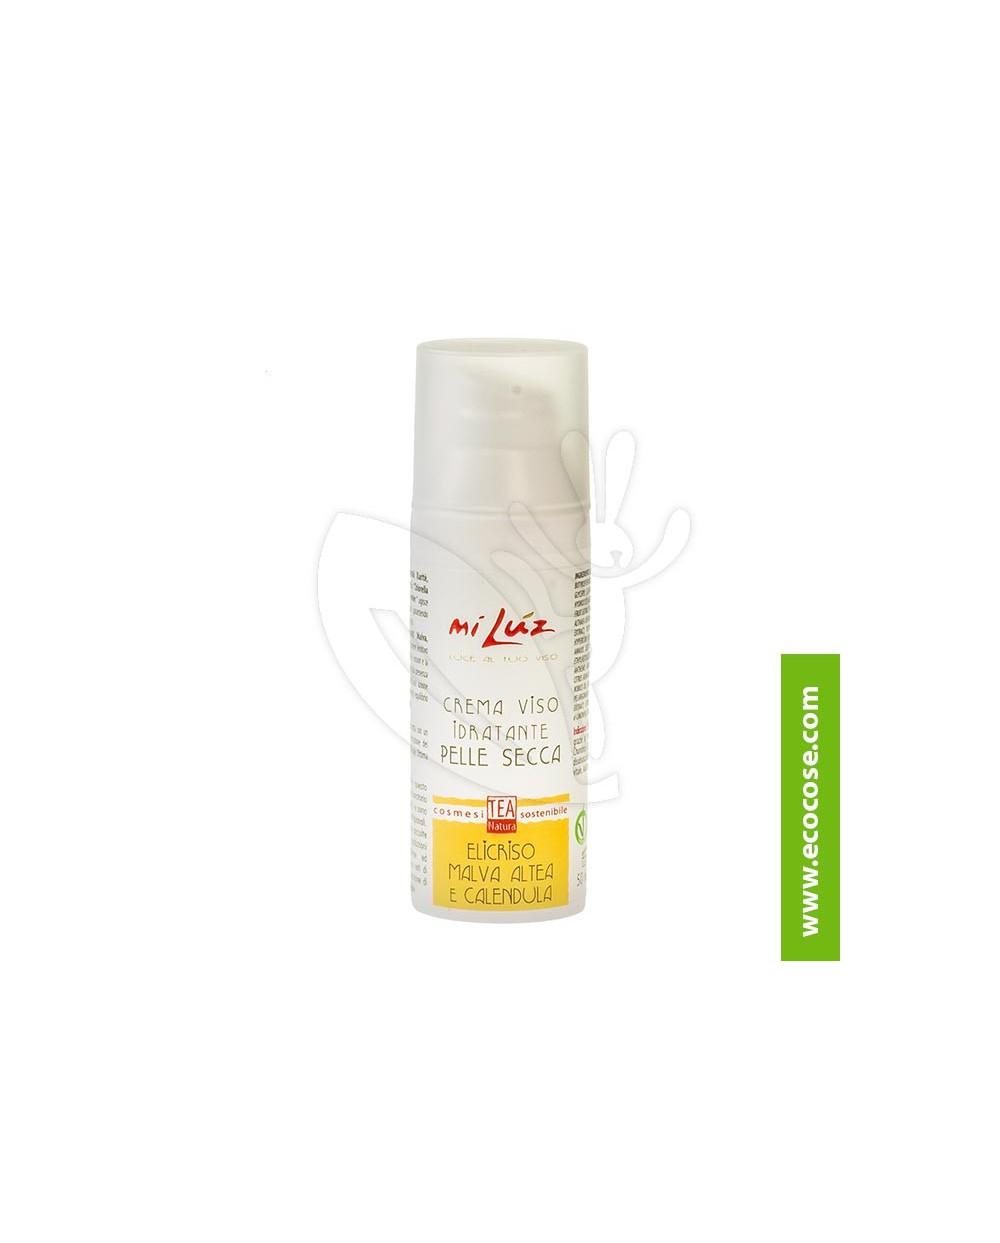 Tea Natura - Mi Lùz Crema viso idratante pelle secca